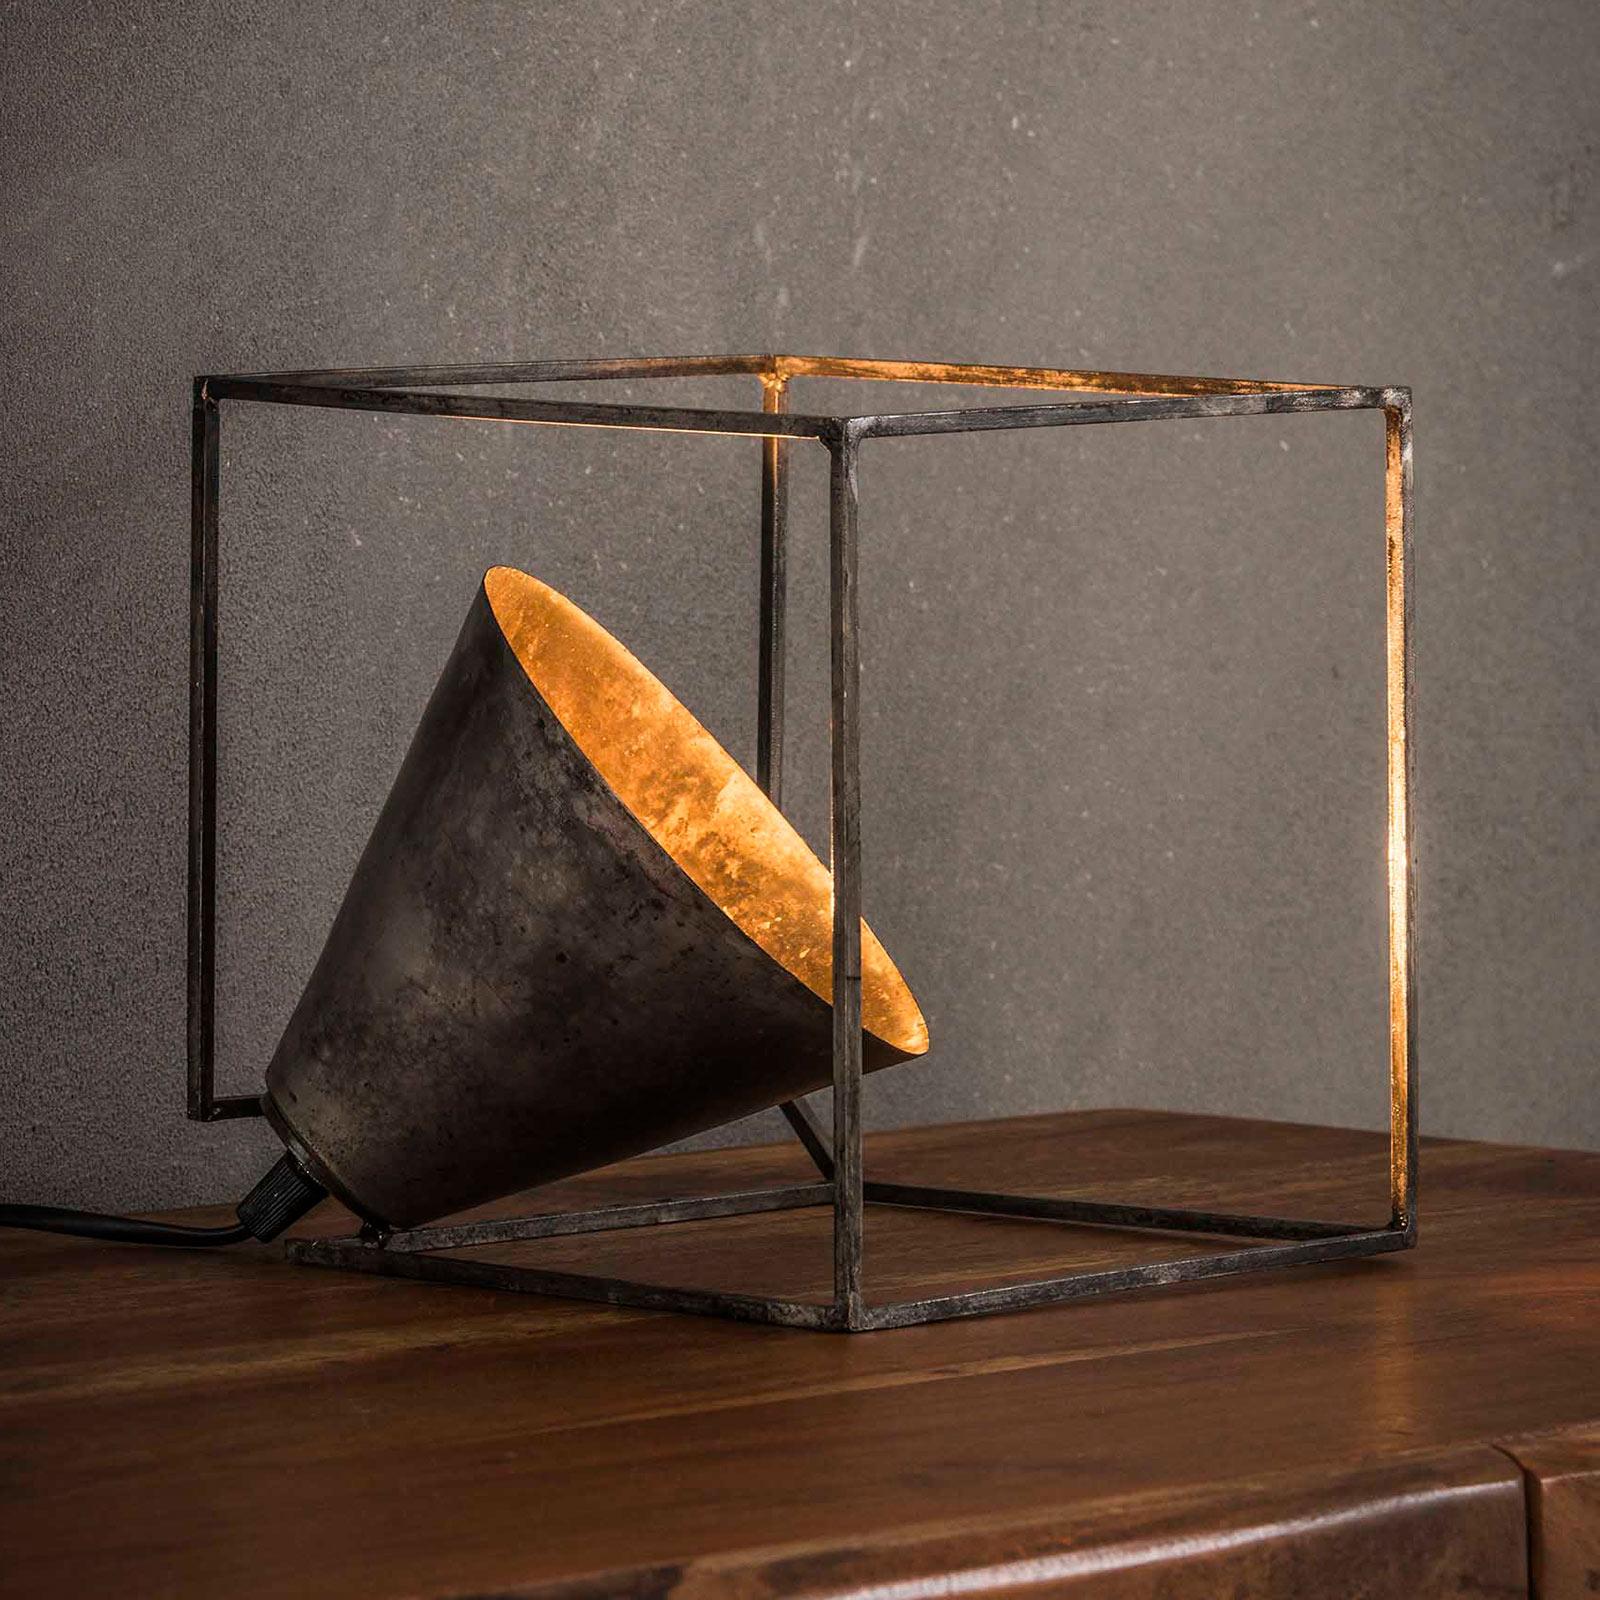 Tafellamp Licobus in opvallend ontwerp